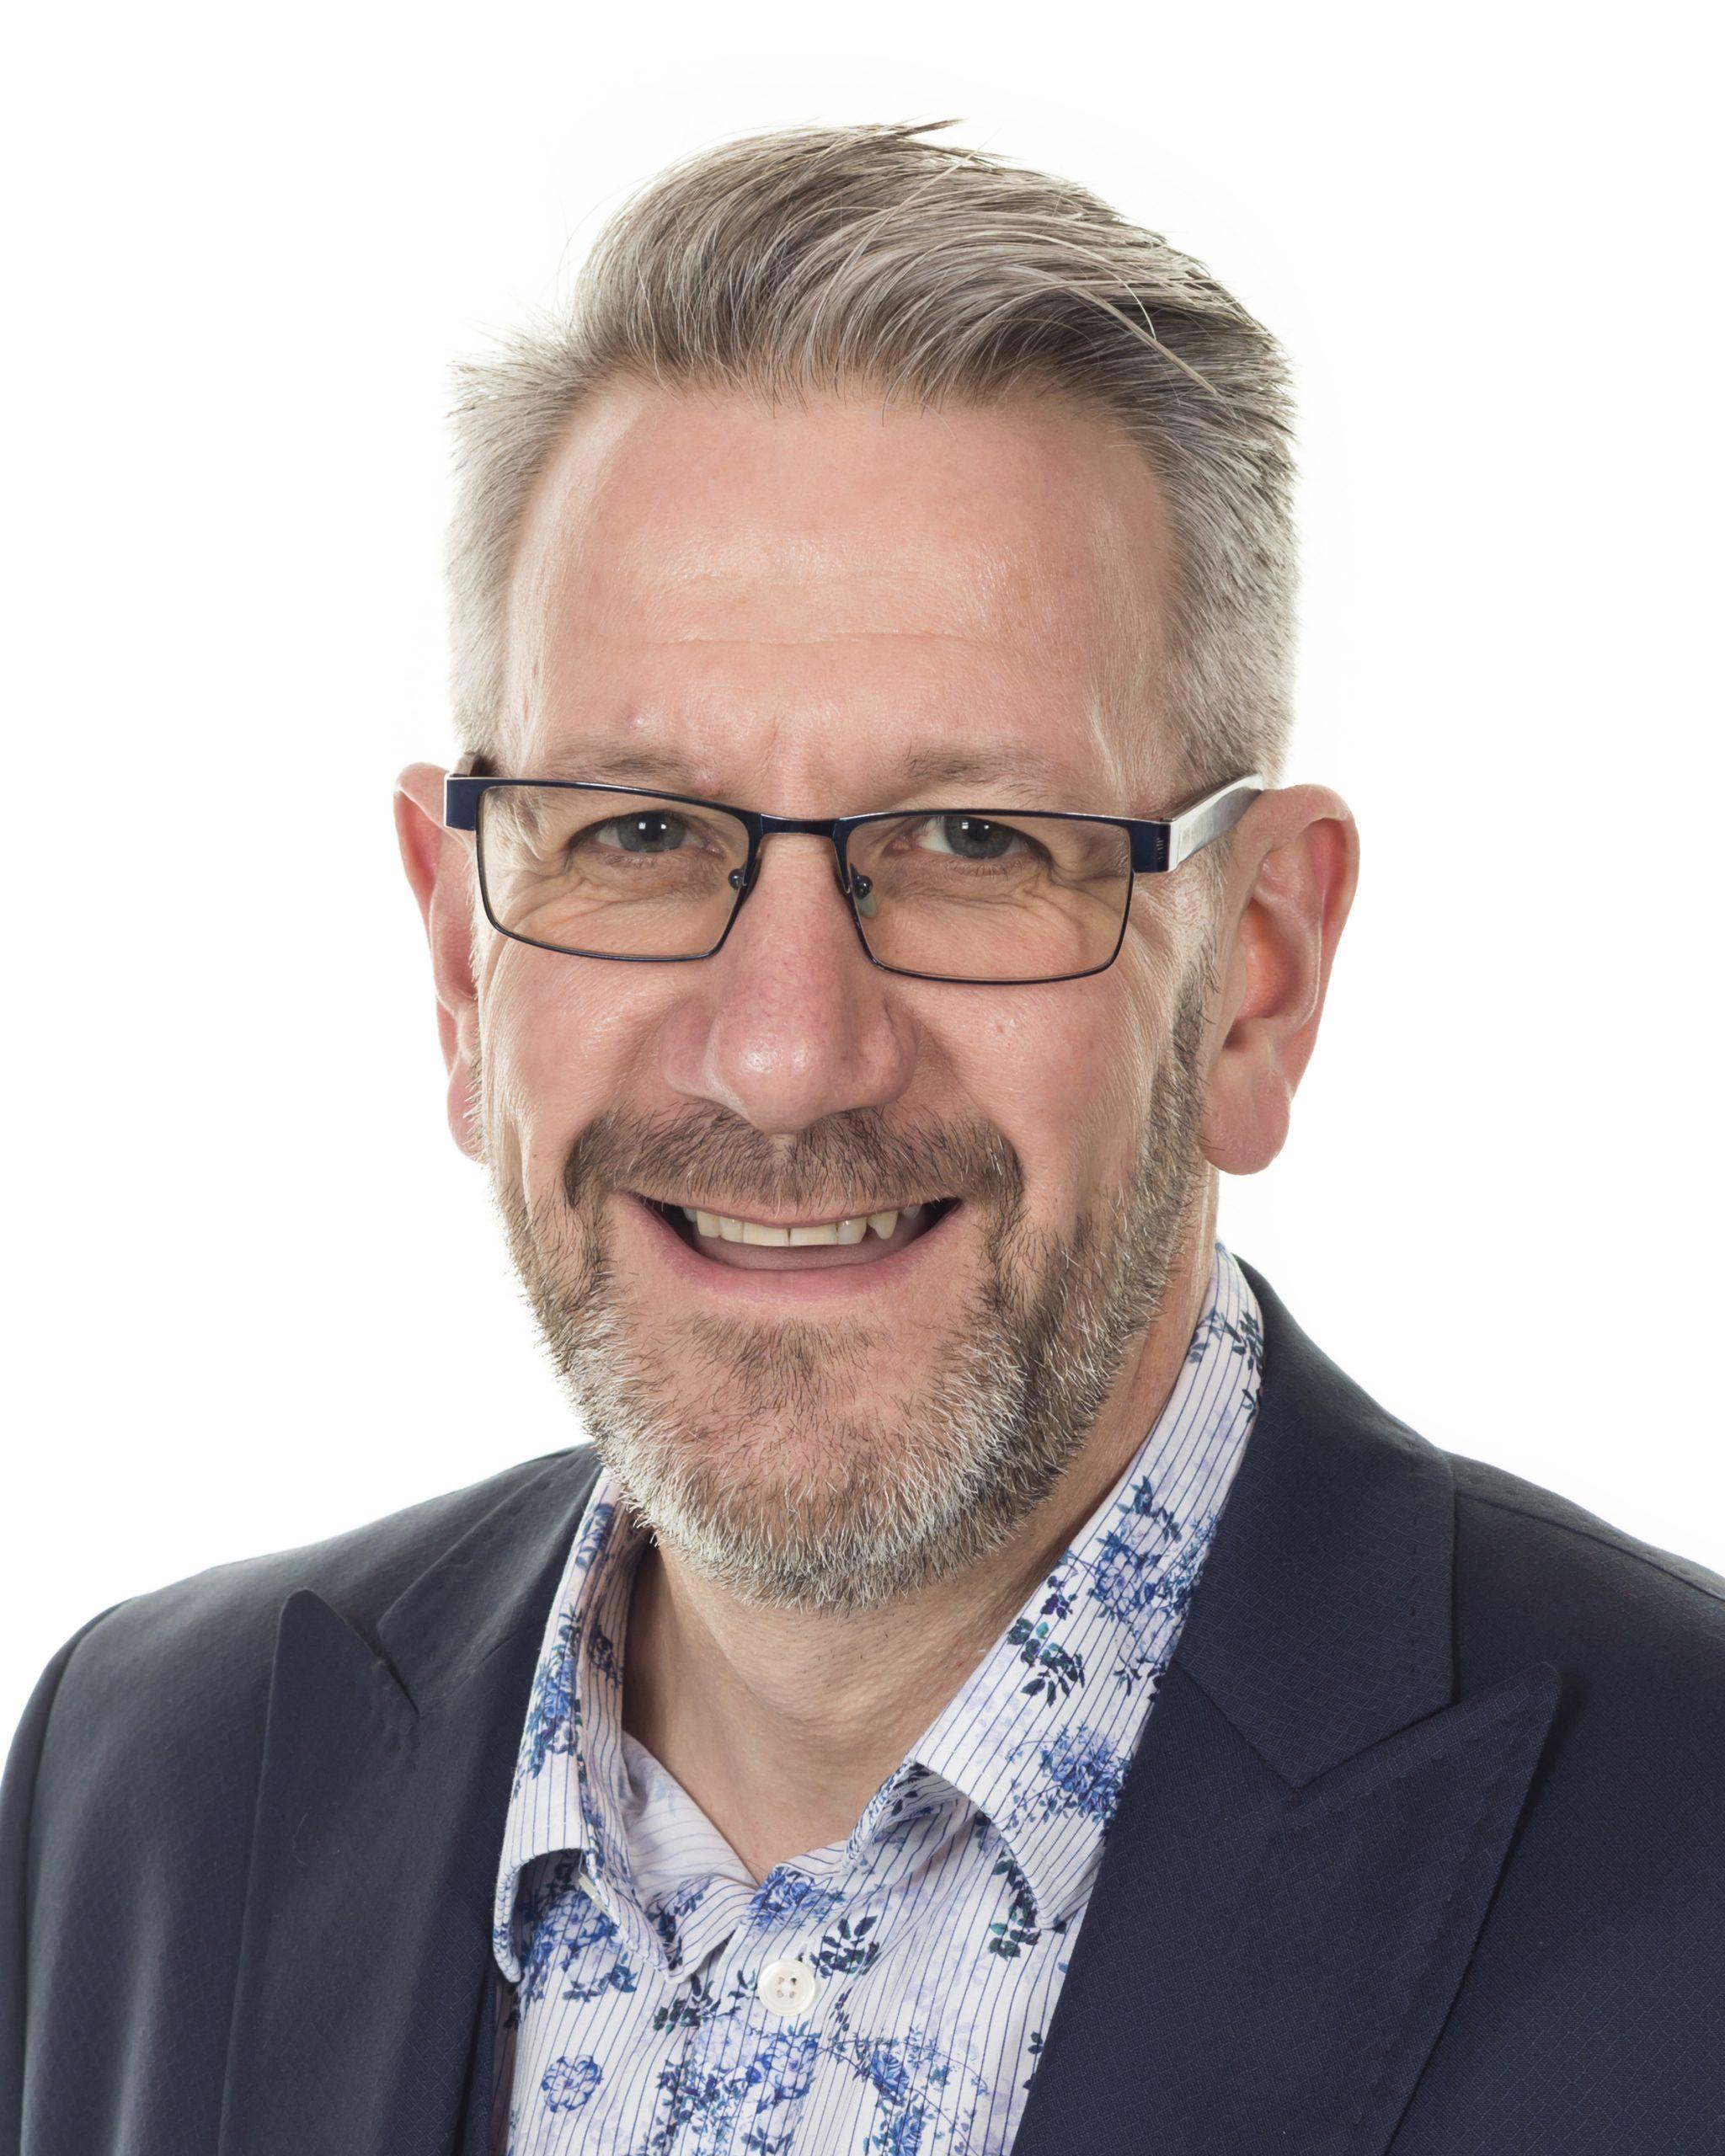 Richard Gardiner of NAG Solutions